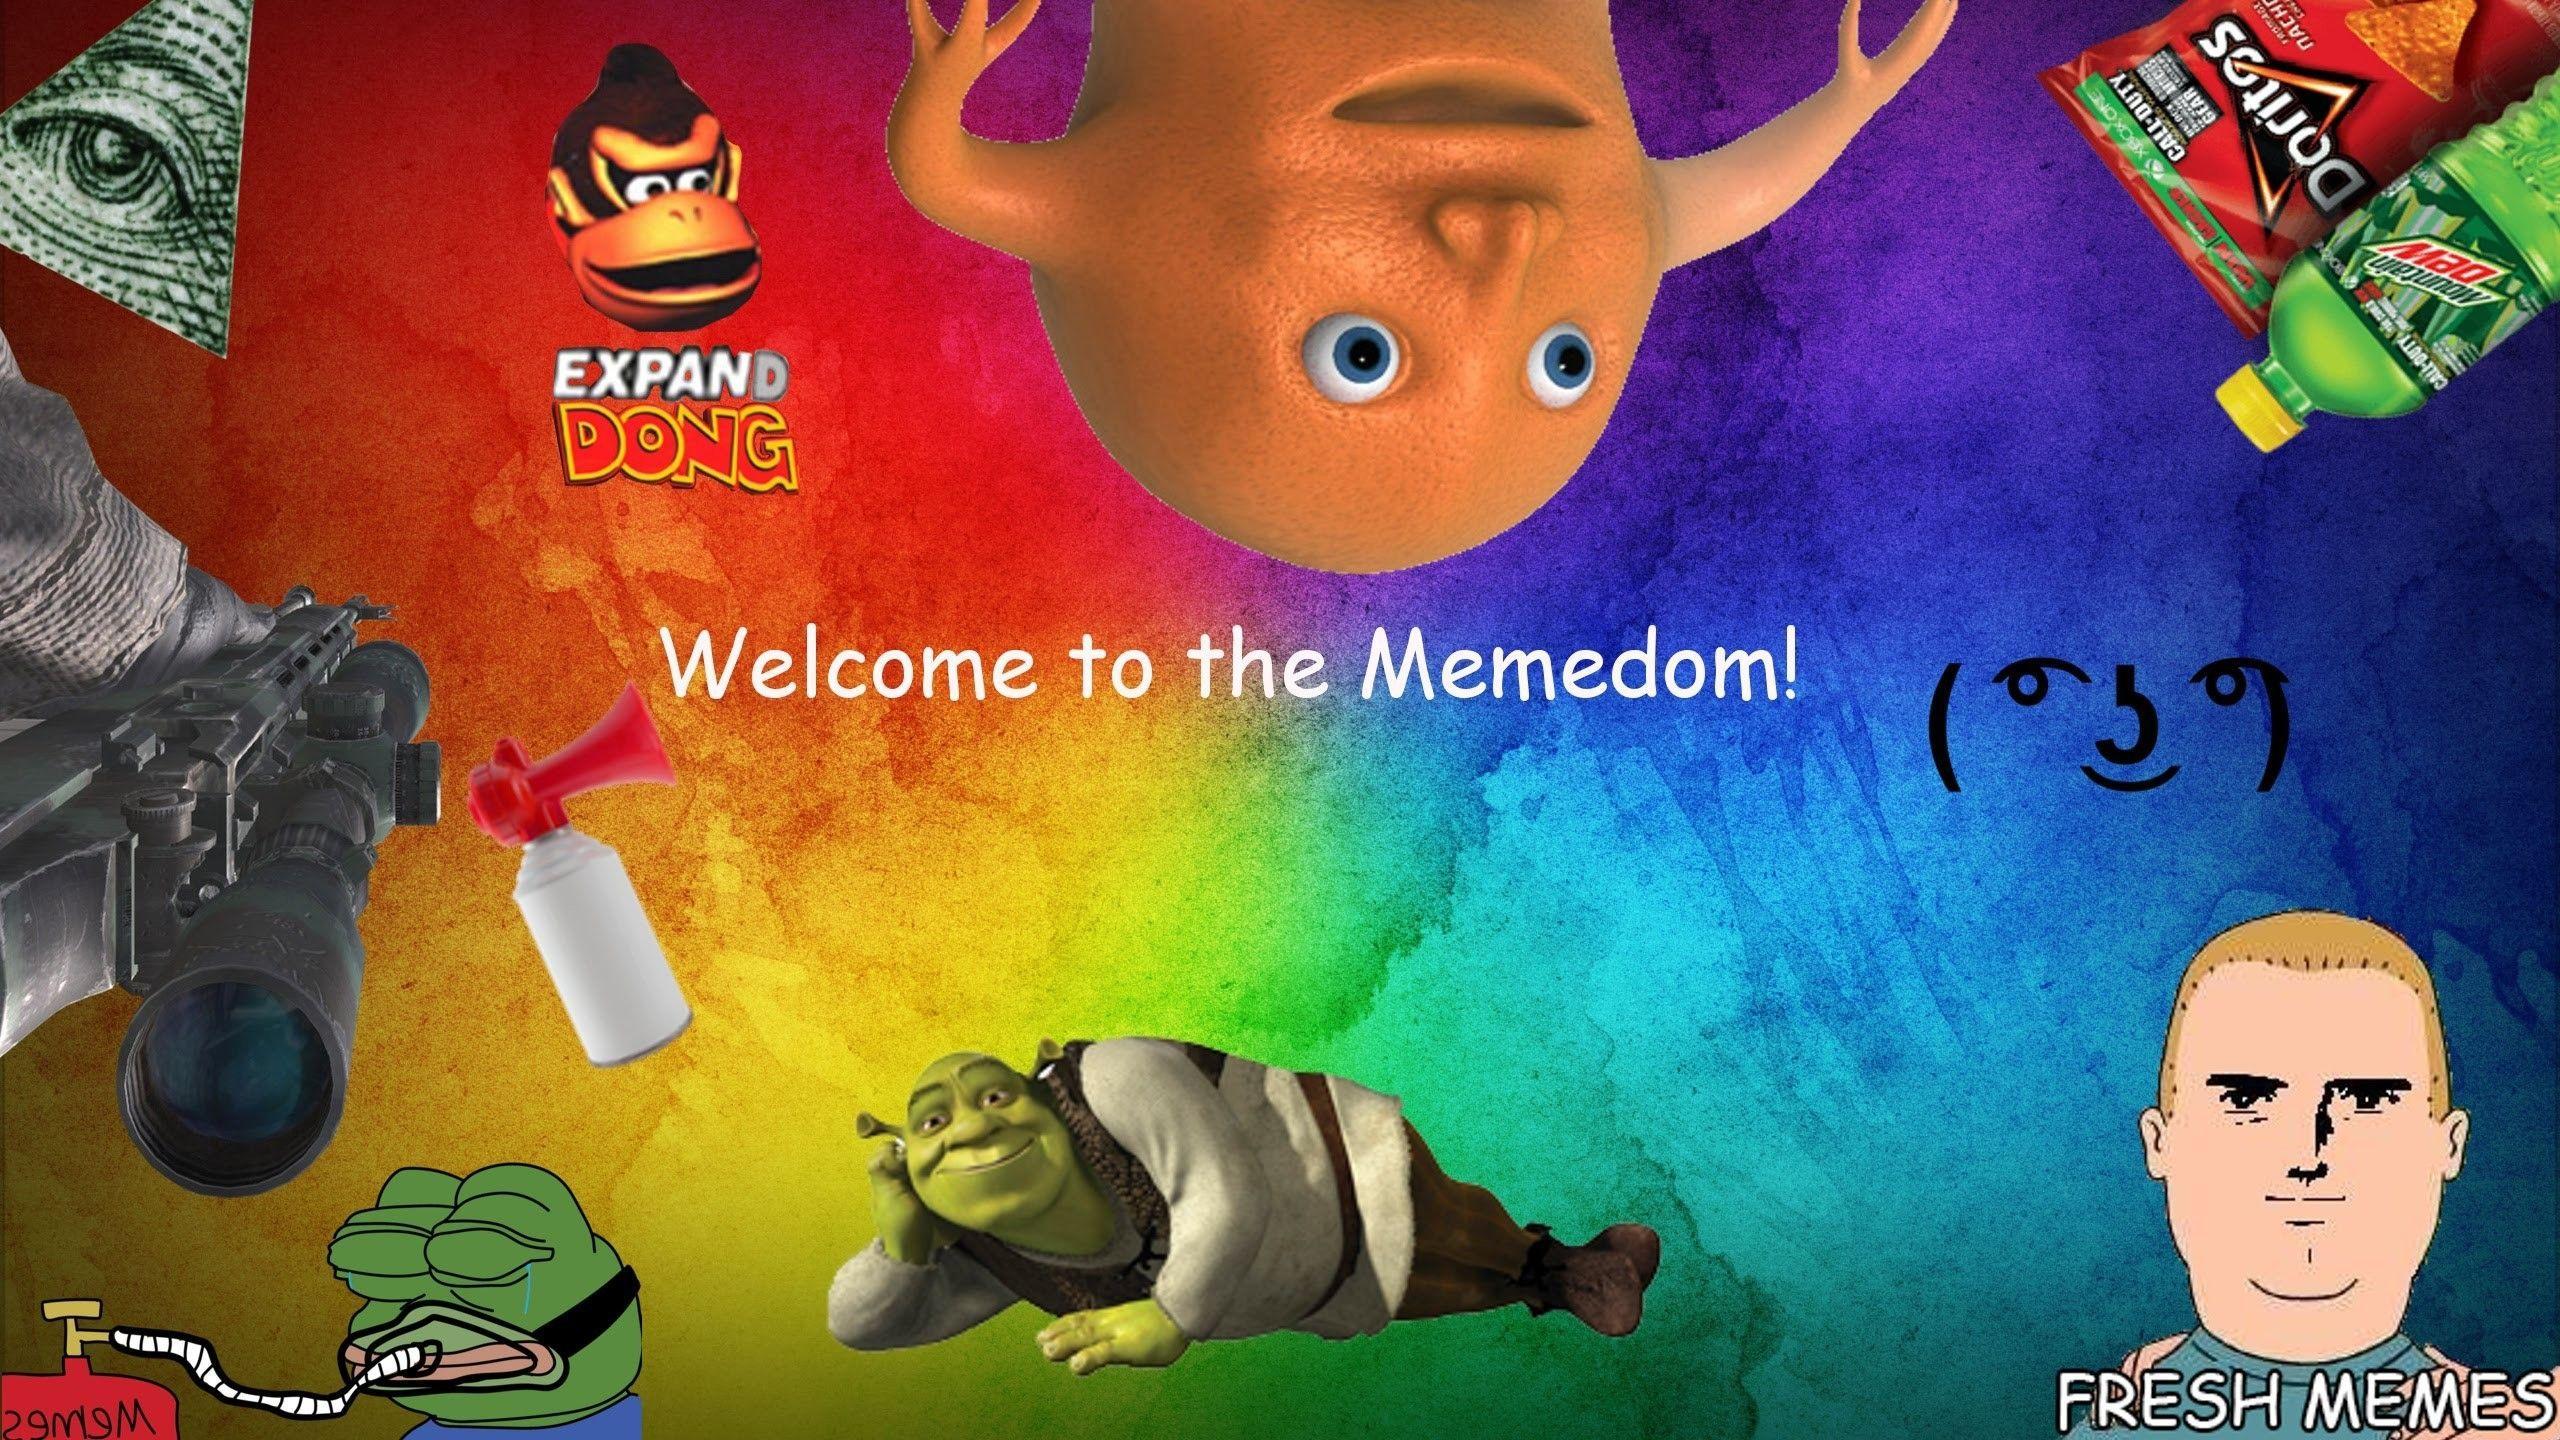 Dank Meme Wallpapers Top Free Dank Meme Backgrounds Wallpaperaccess